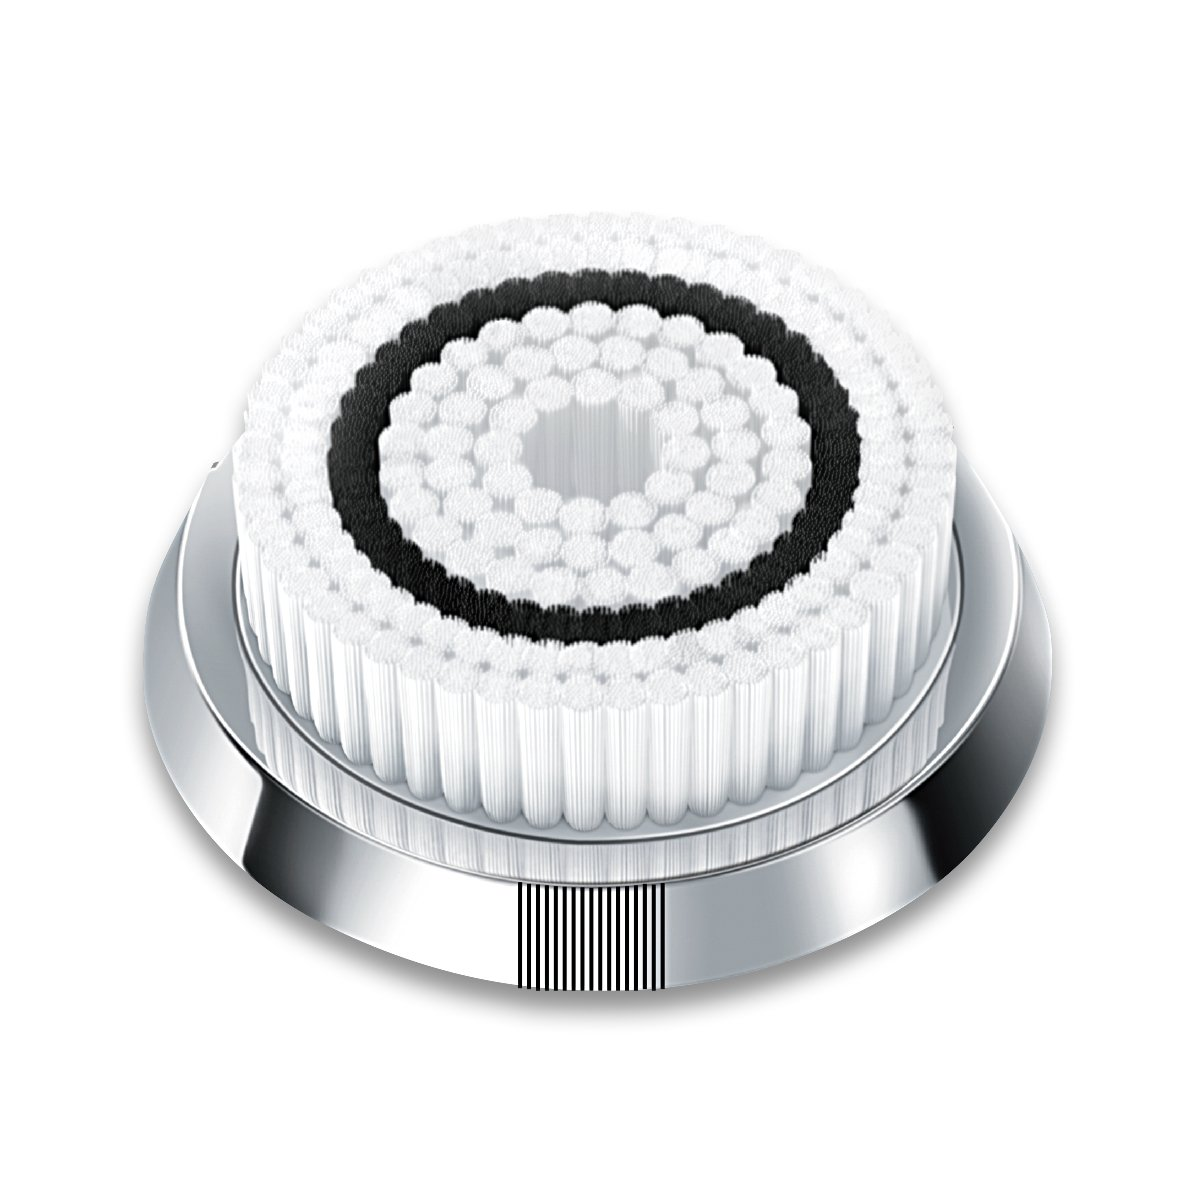 Normal Brush Head For Hangsun Sc200 Facial Cleansing Brushes Heads Skin Care System Waterproof